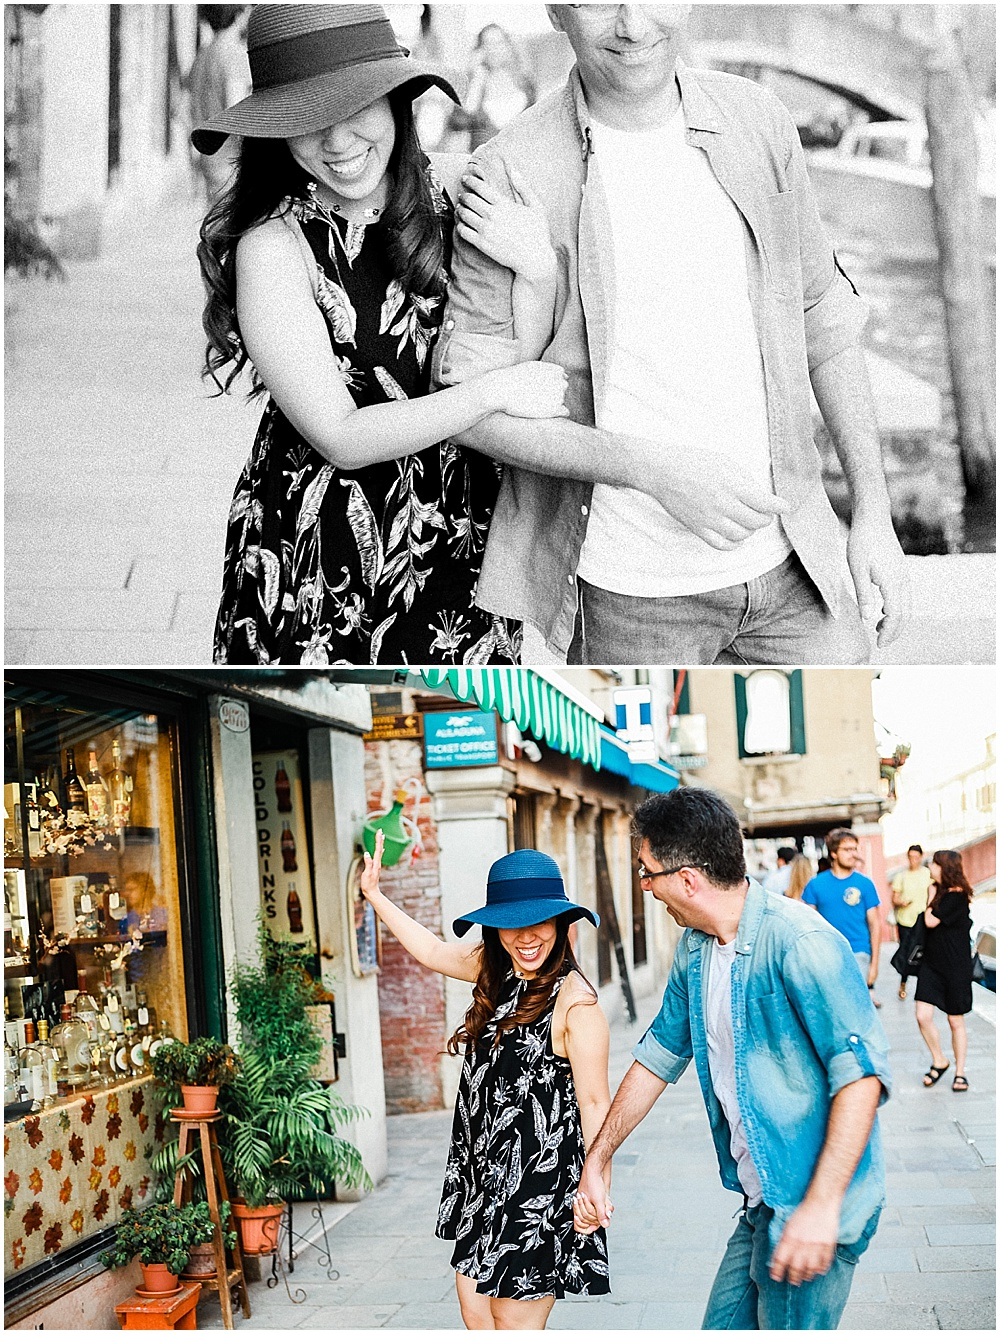 venice-anniversary-wedding-photographer-stefano-degirmenci_0146.jpg